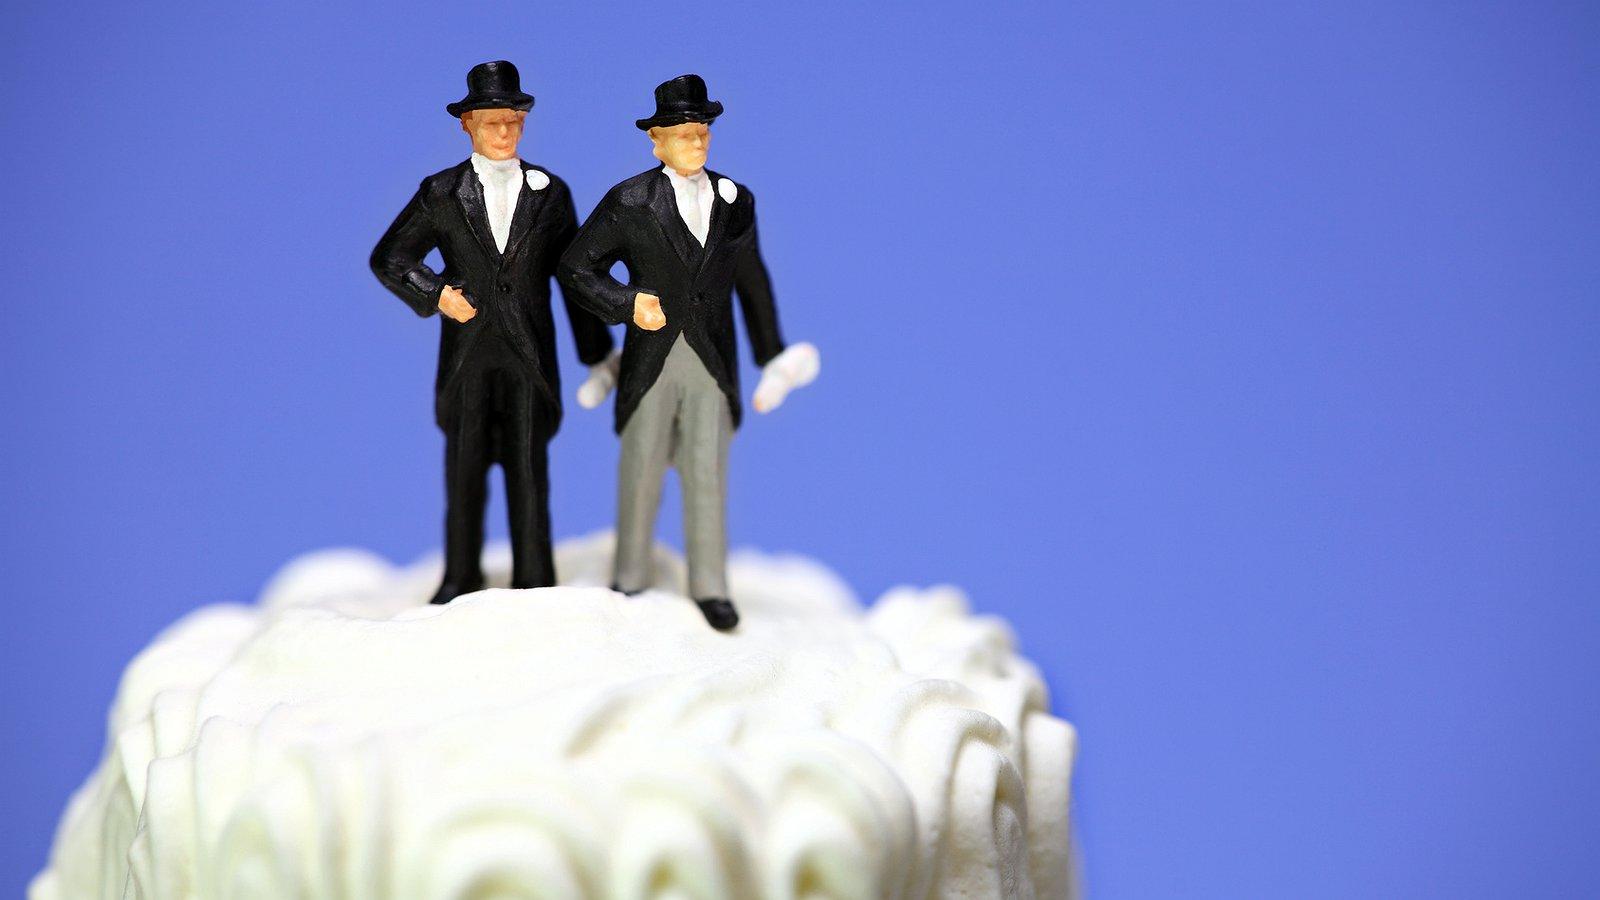 Duitse homo's mogen eindelijk trouwen!